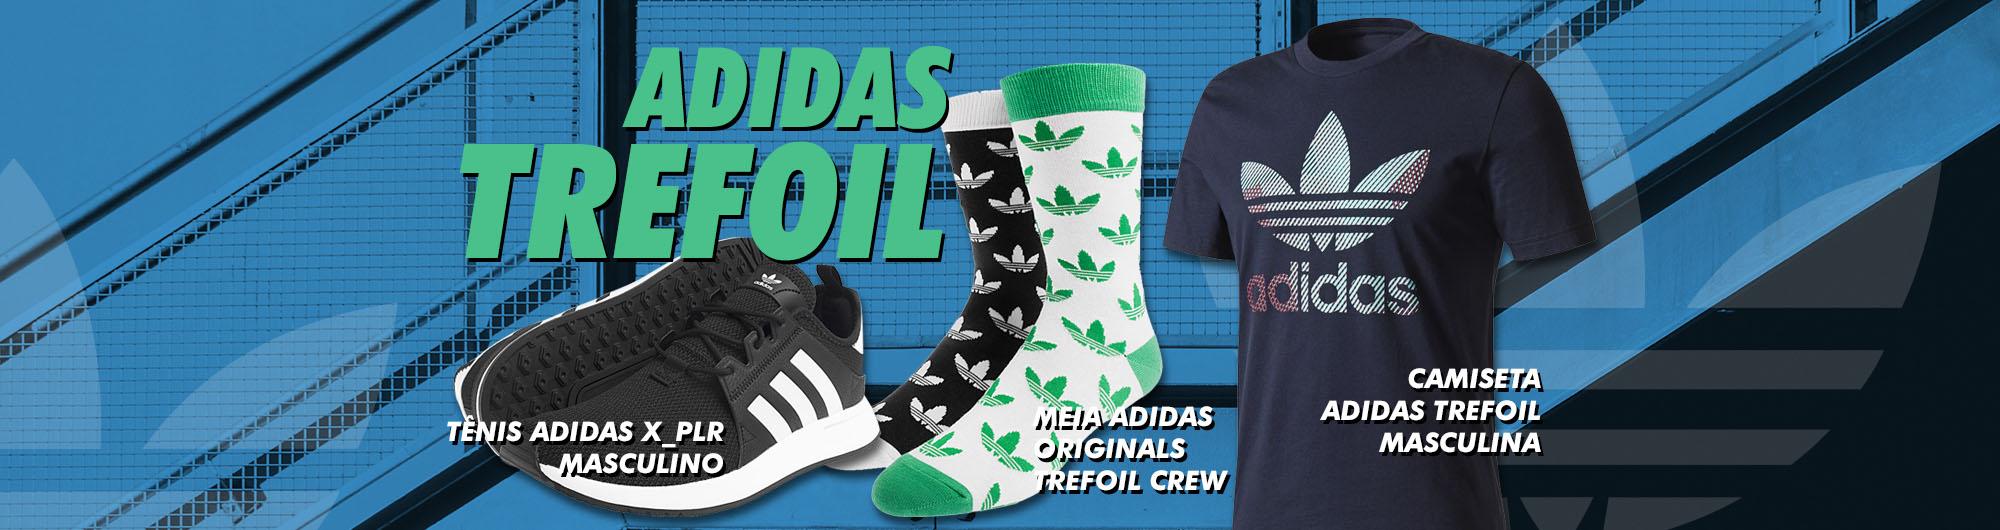 BTV2-adidas_Trefoil